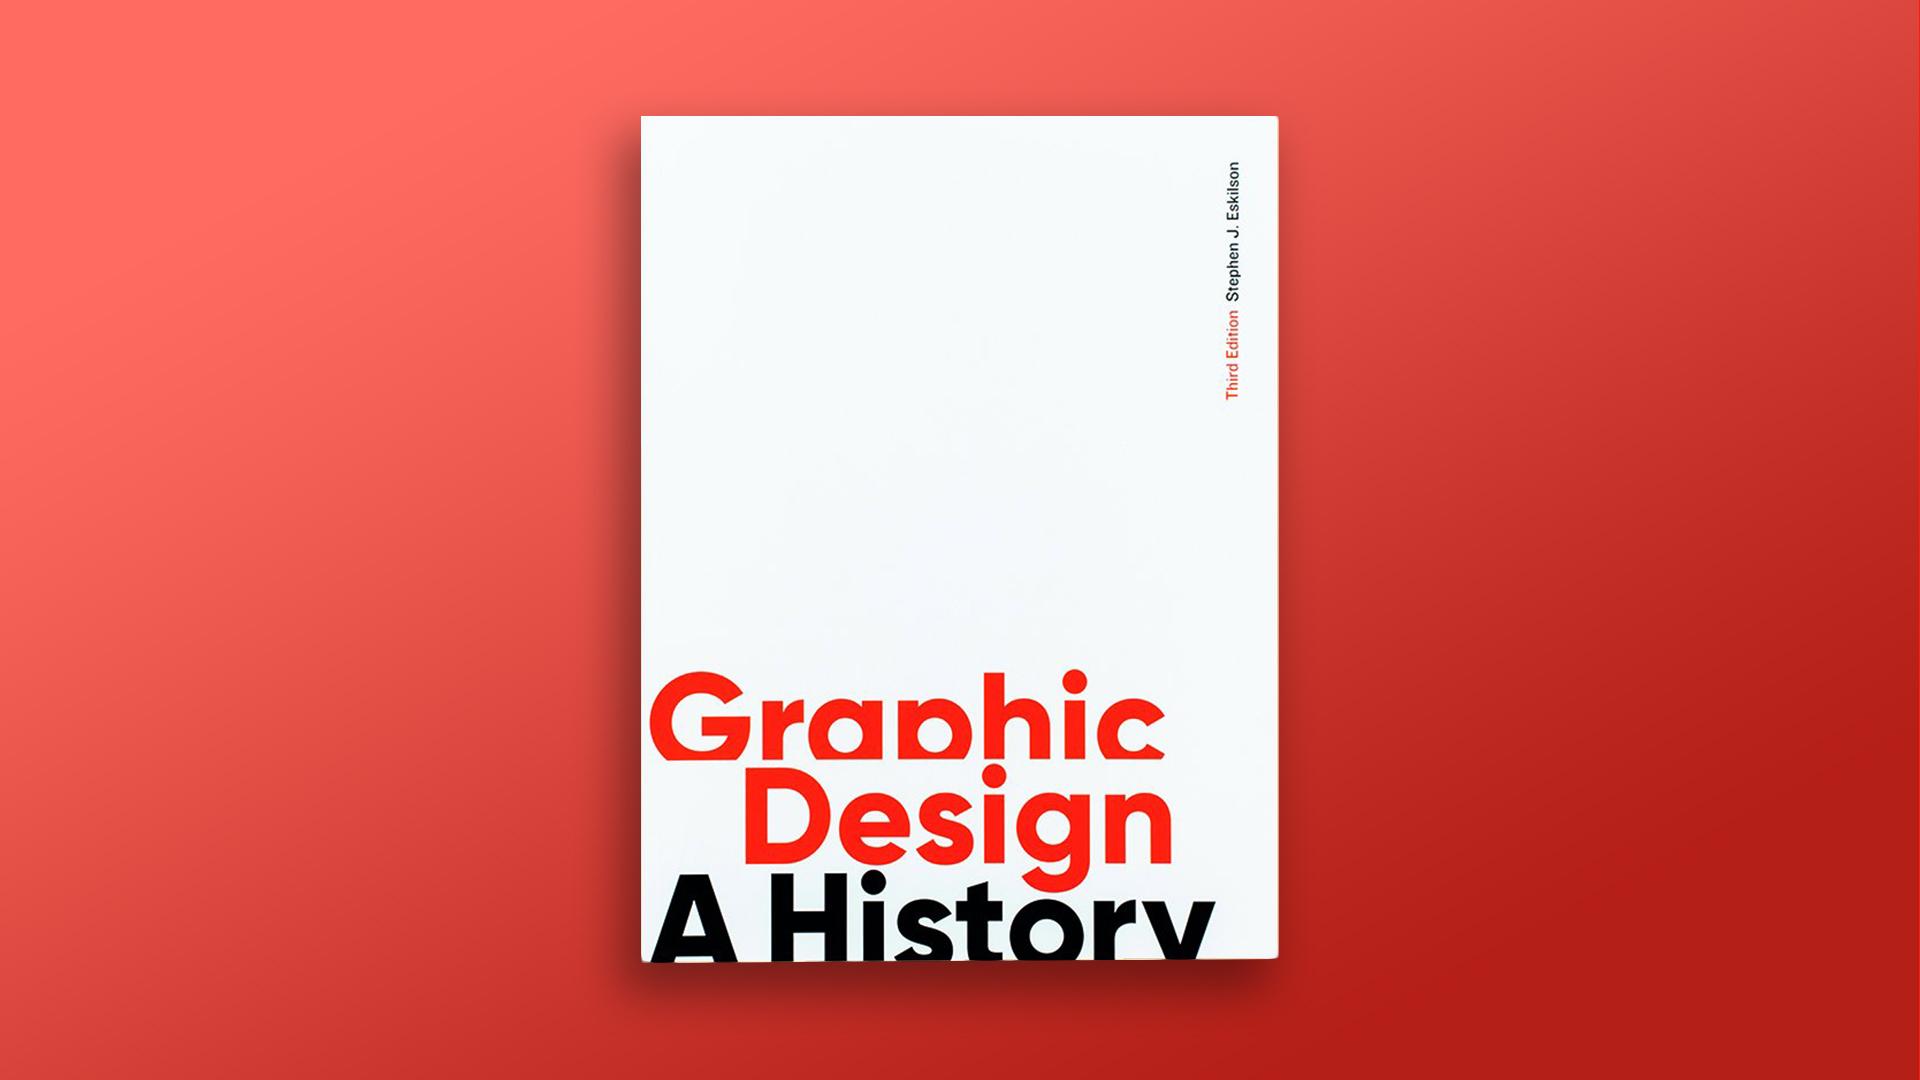 Graphic Design a history Best Graphic Design Books